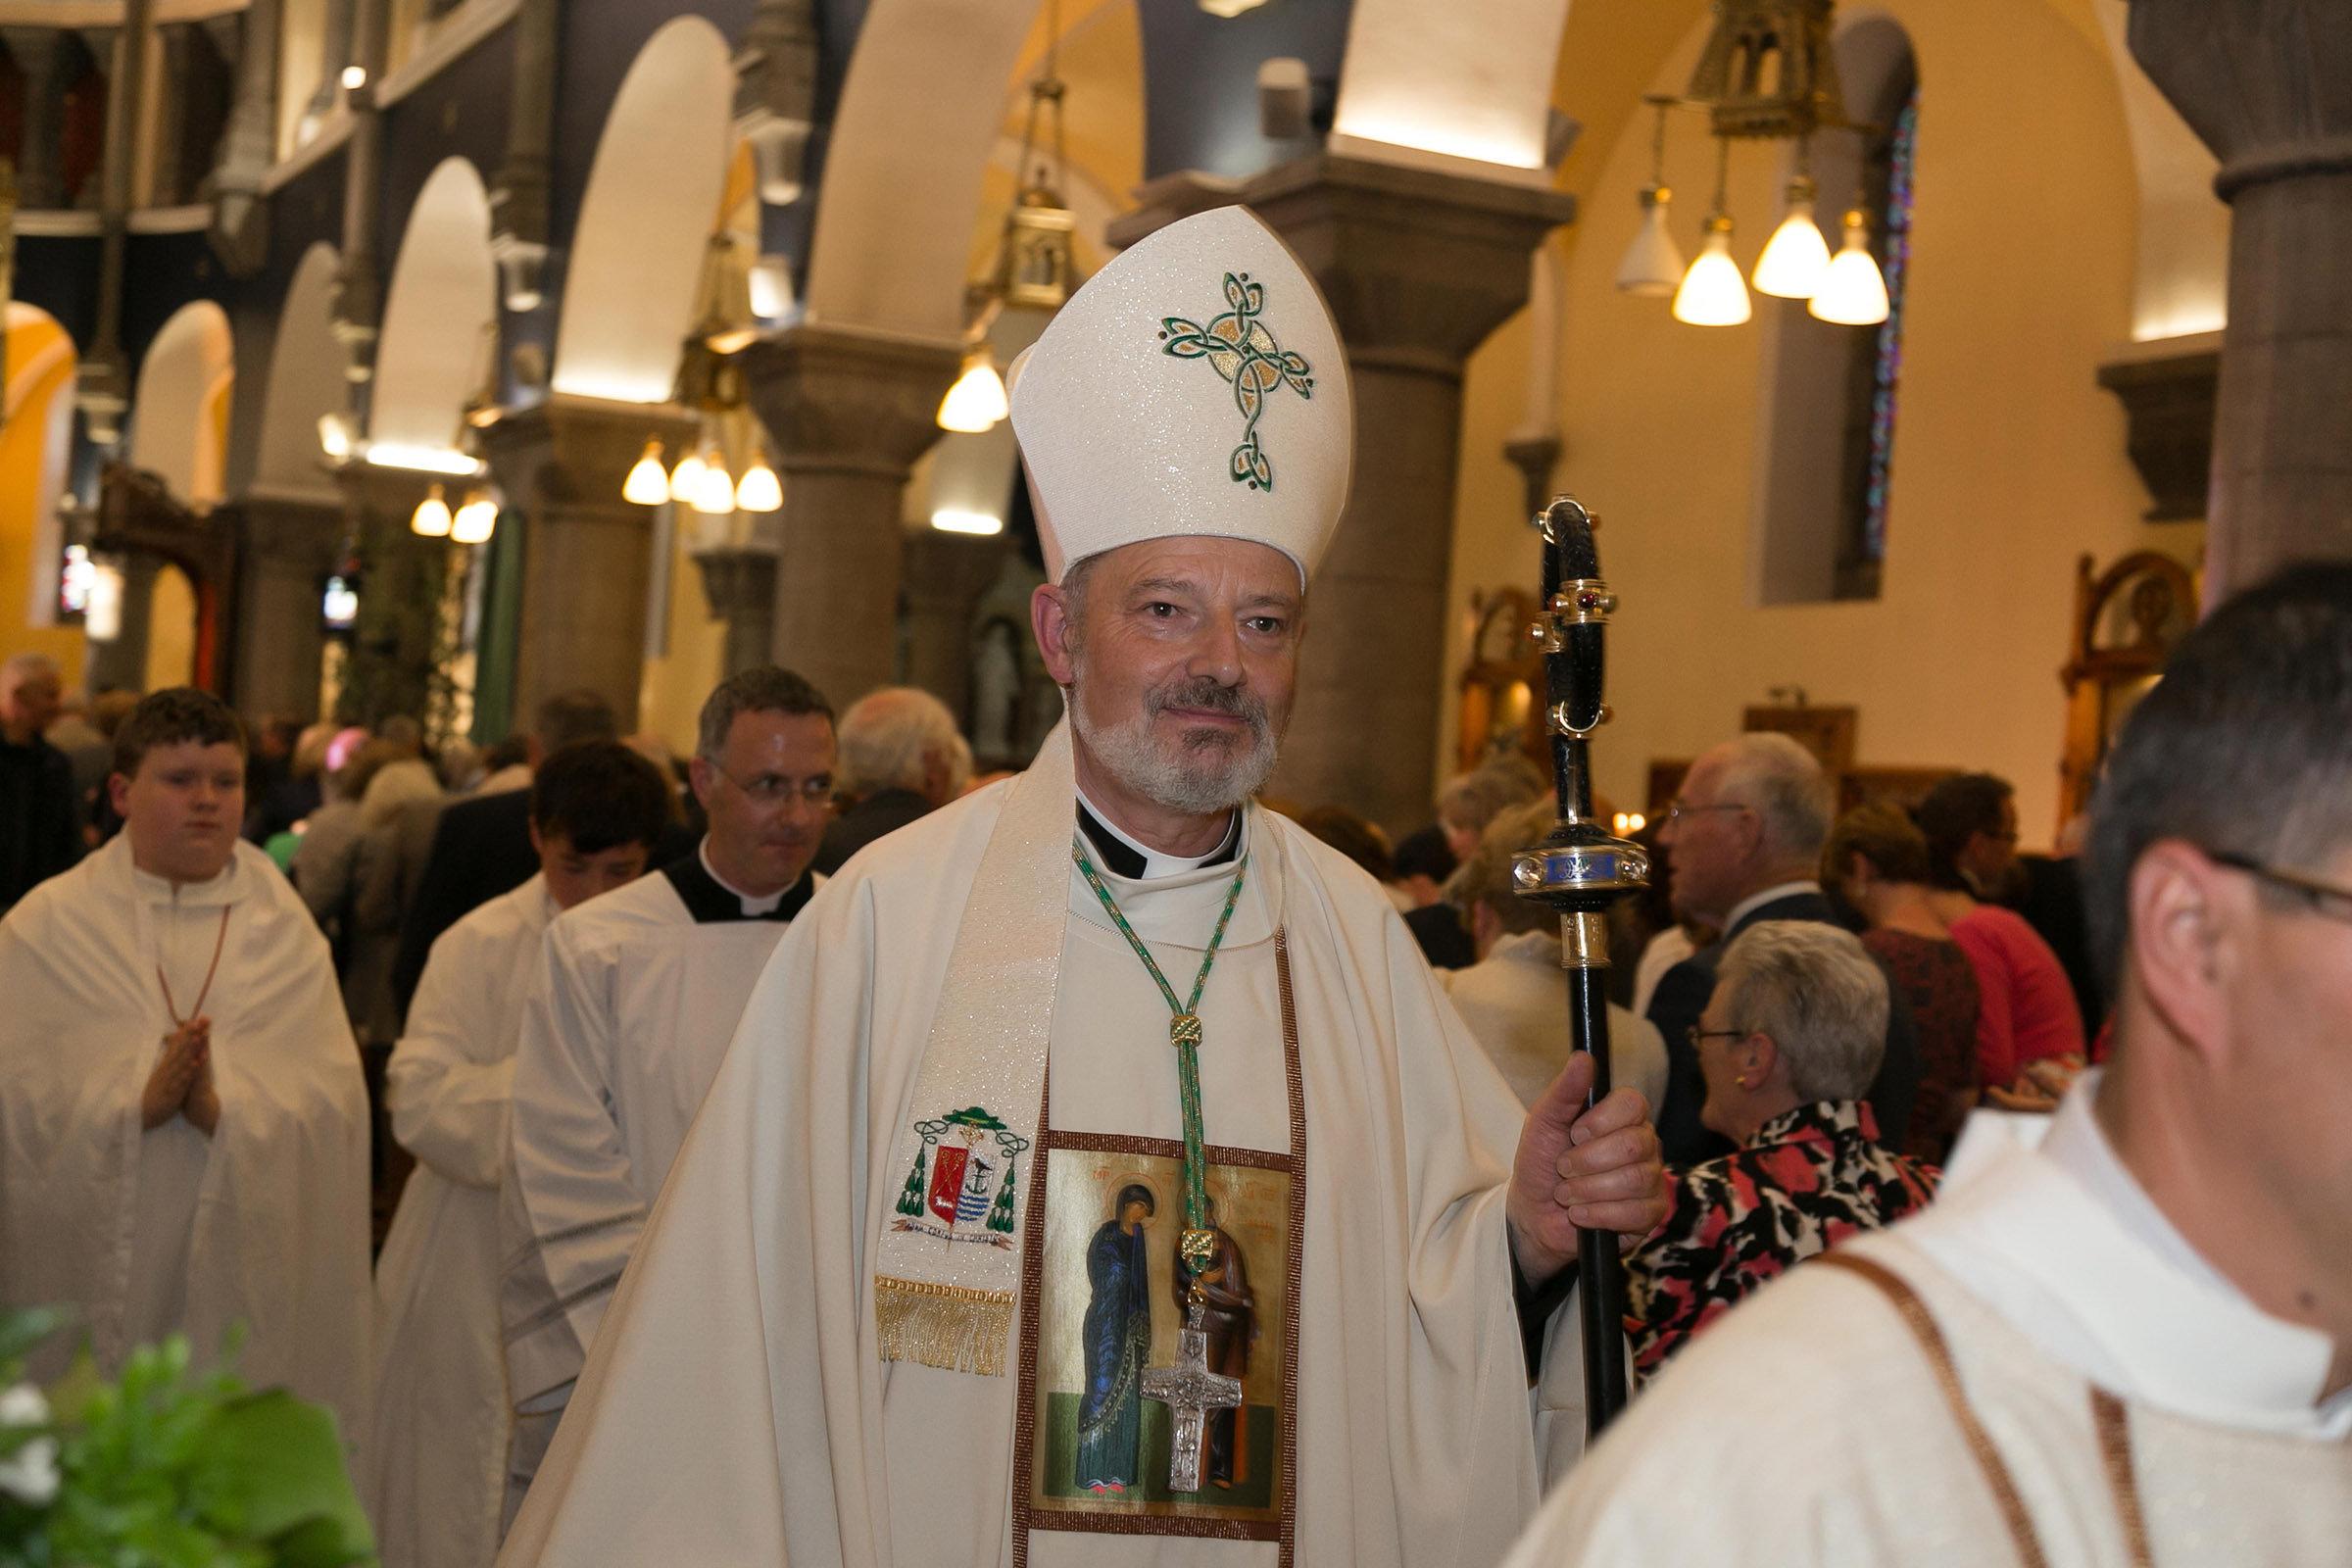 How to Address a Catholic Bishop